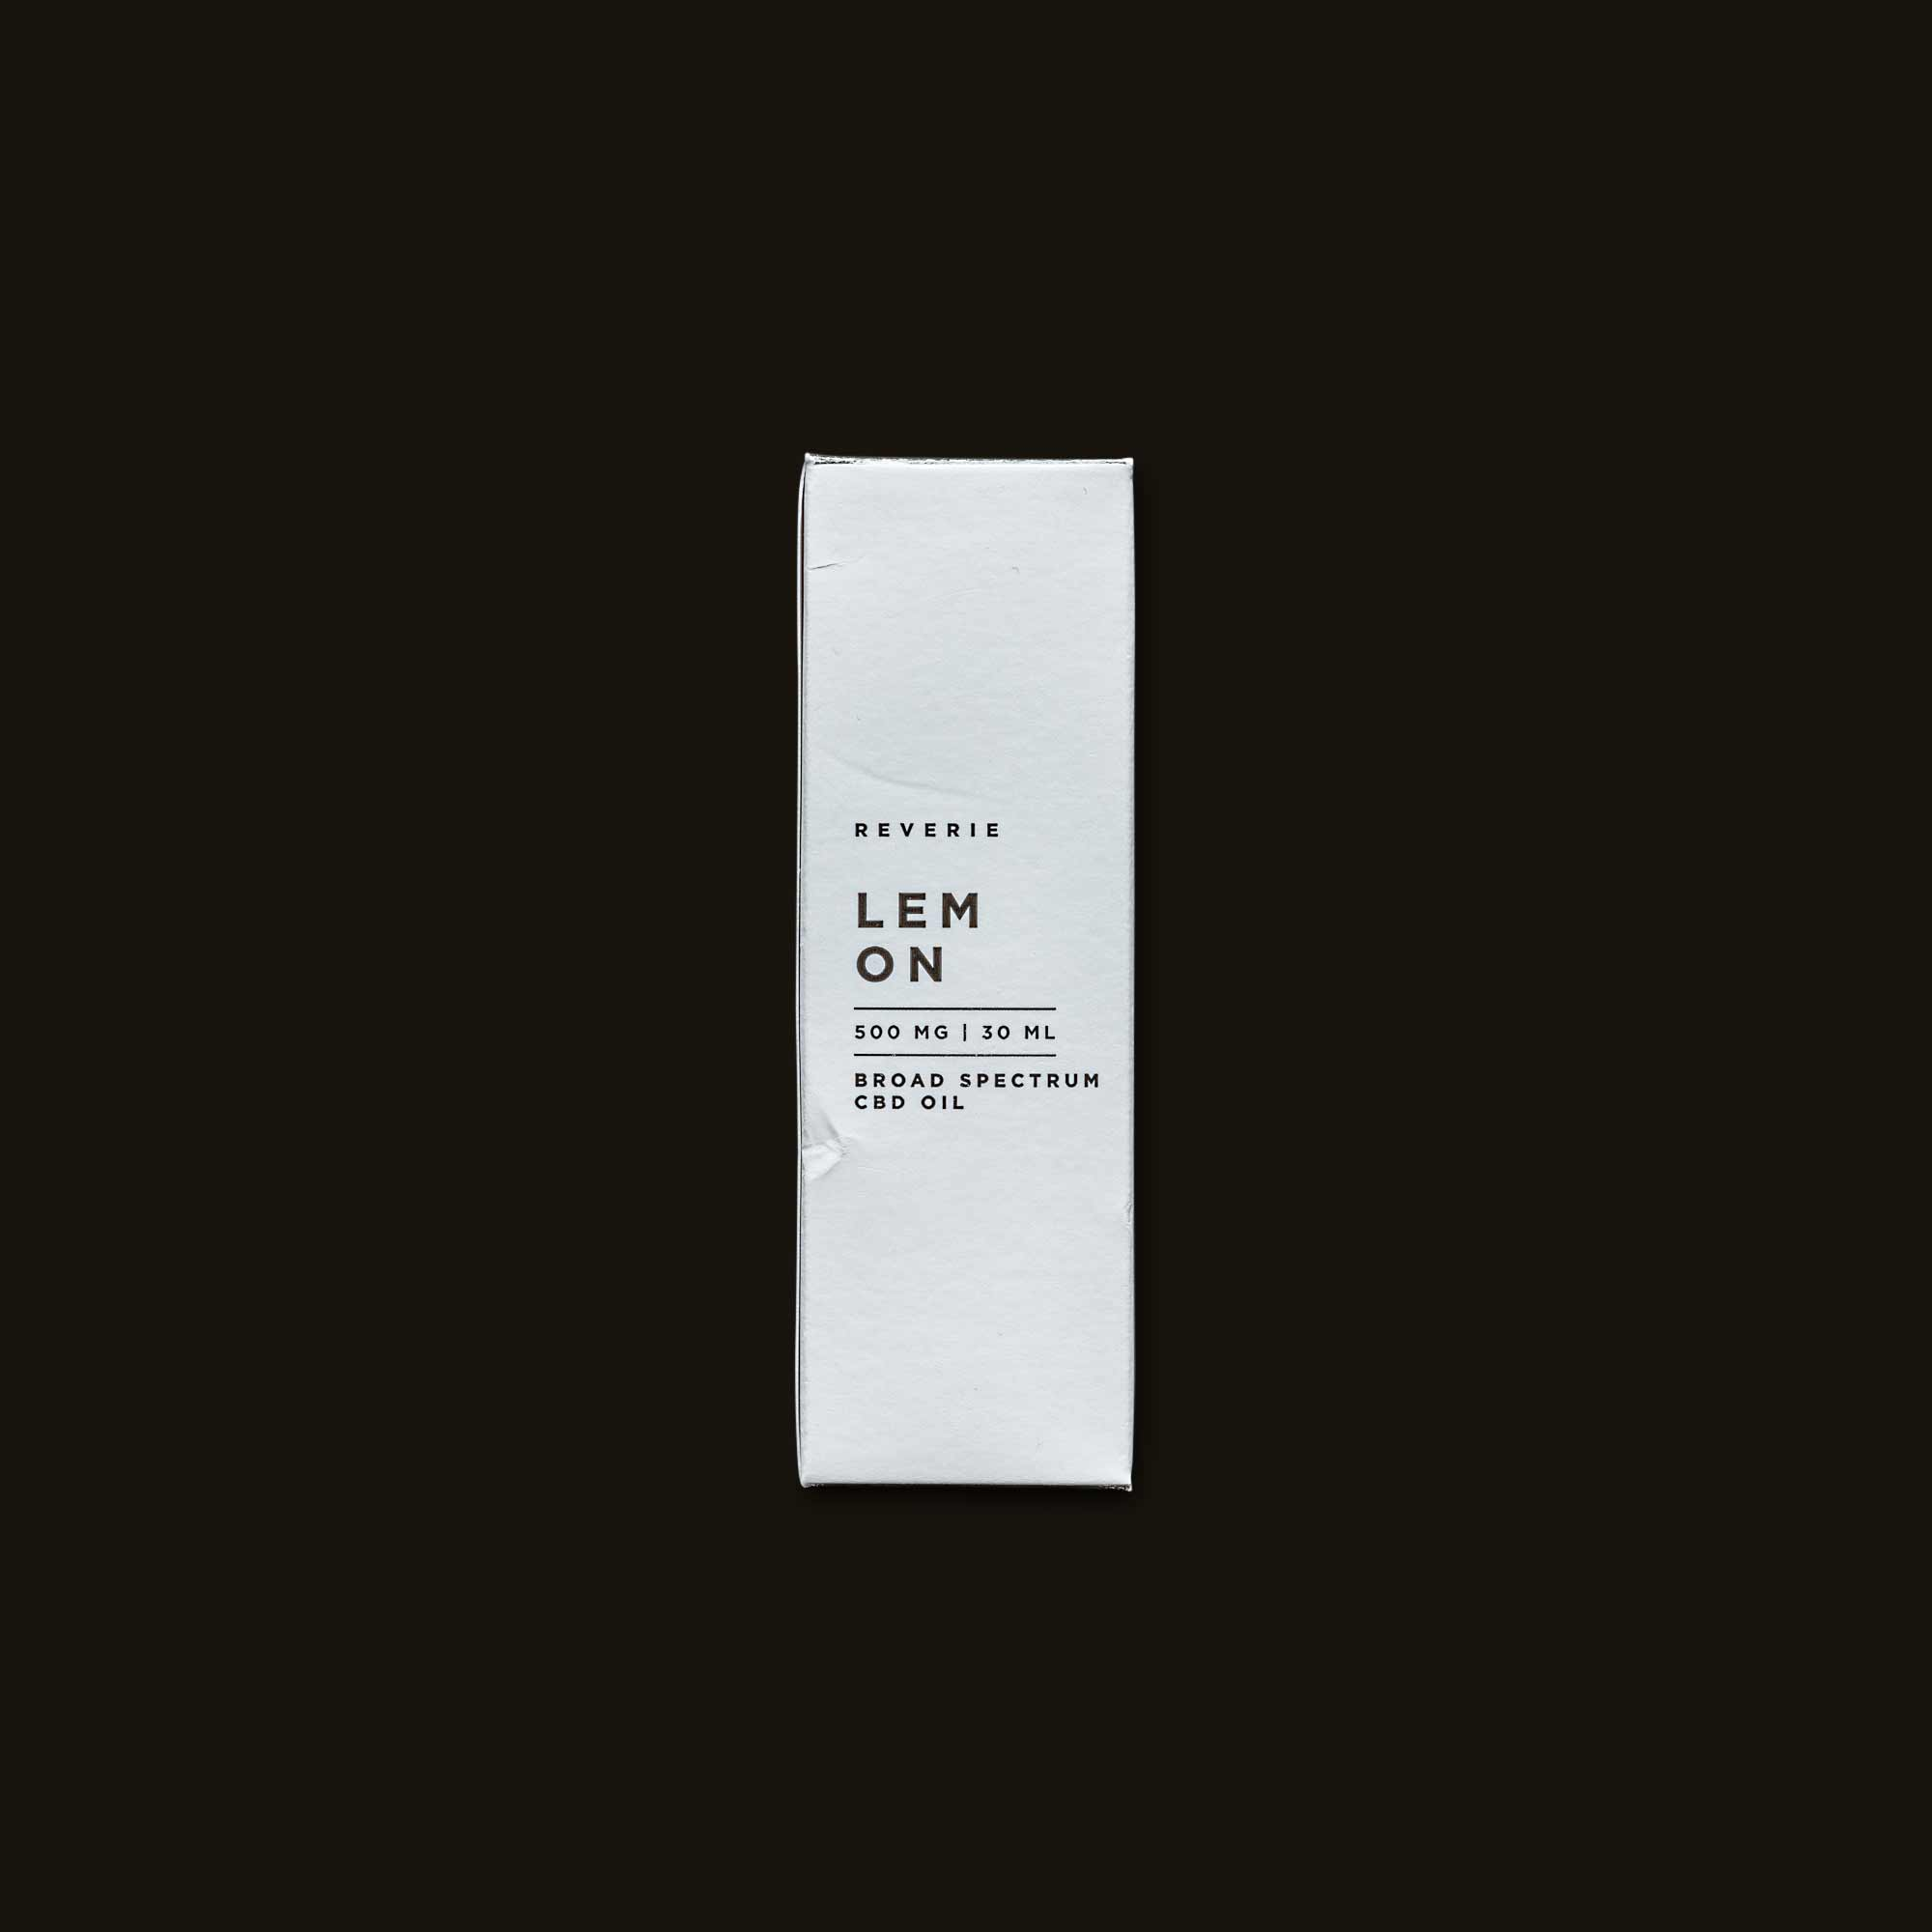 Lemon Broad Spectrum CBD Oil - 30ml (500mg CBD)